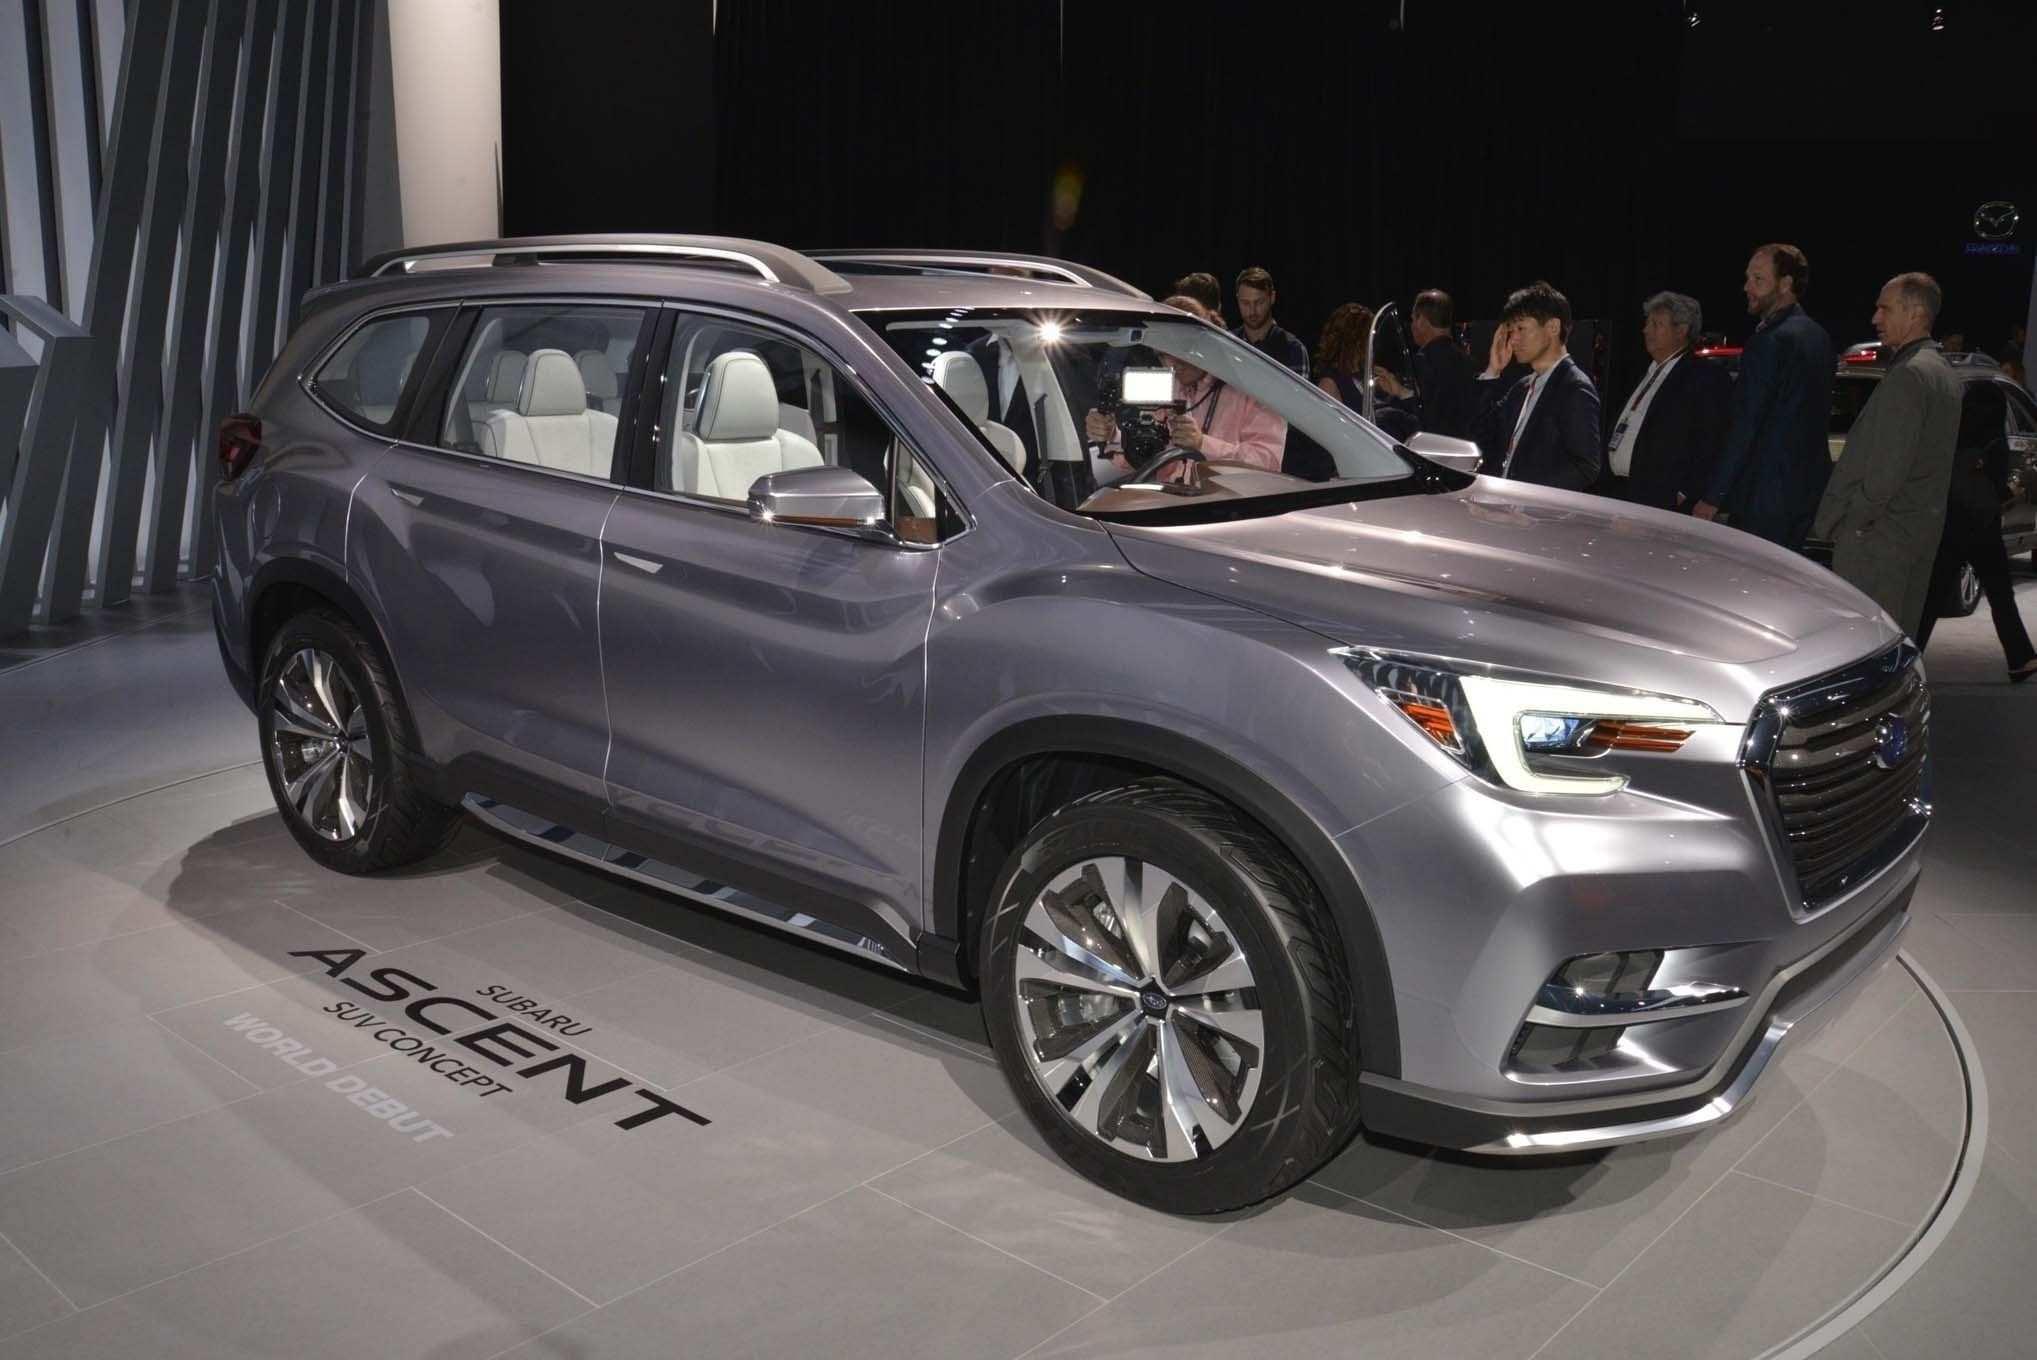 32 Concept of The Subaru 2019 Baja Review Spy Shoot for The Subaru 2019 Baja Review